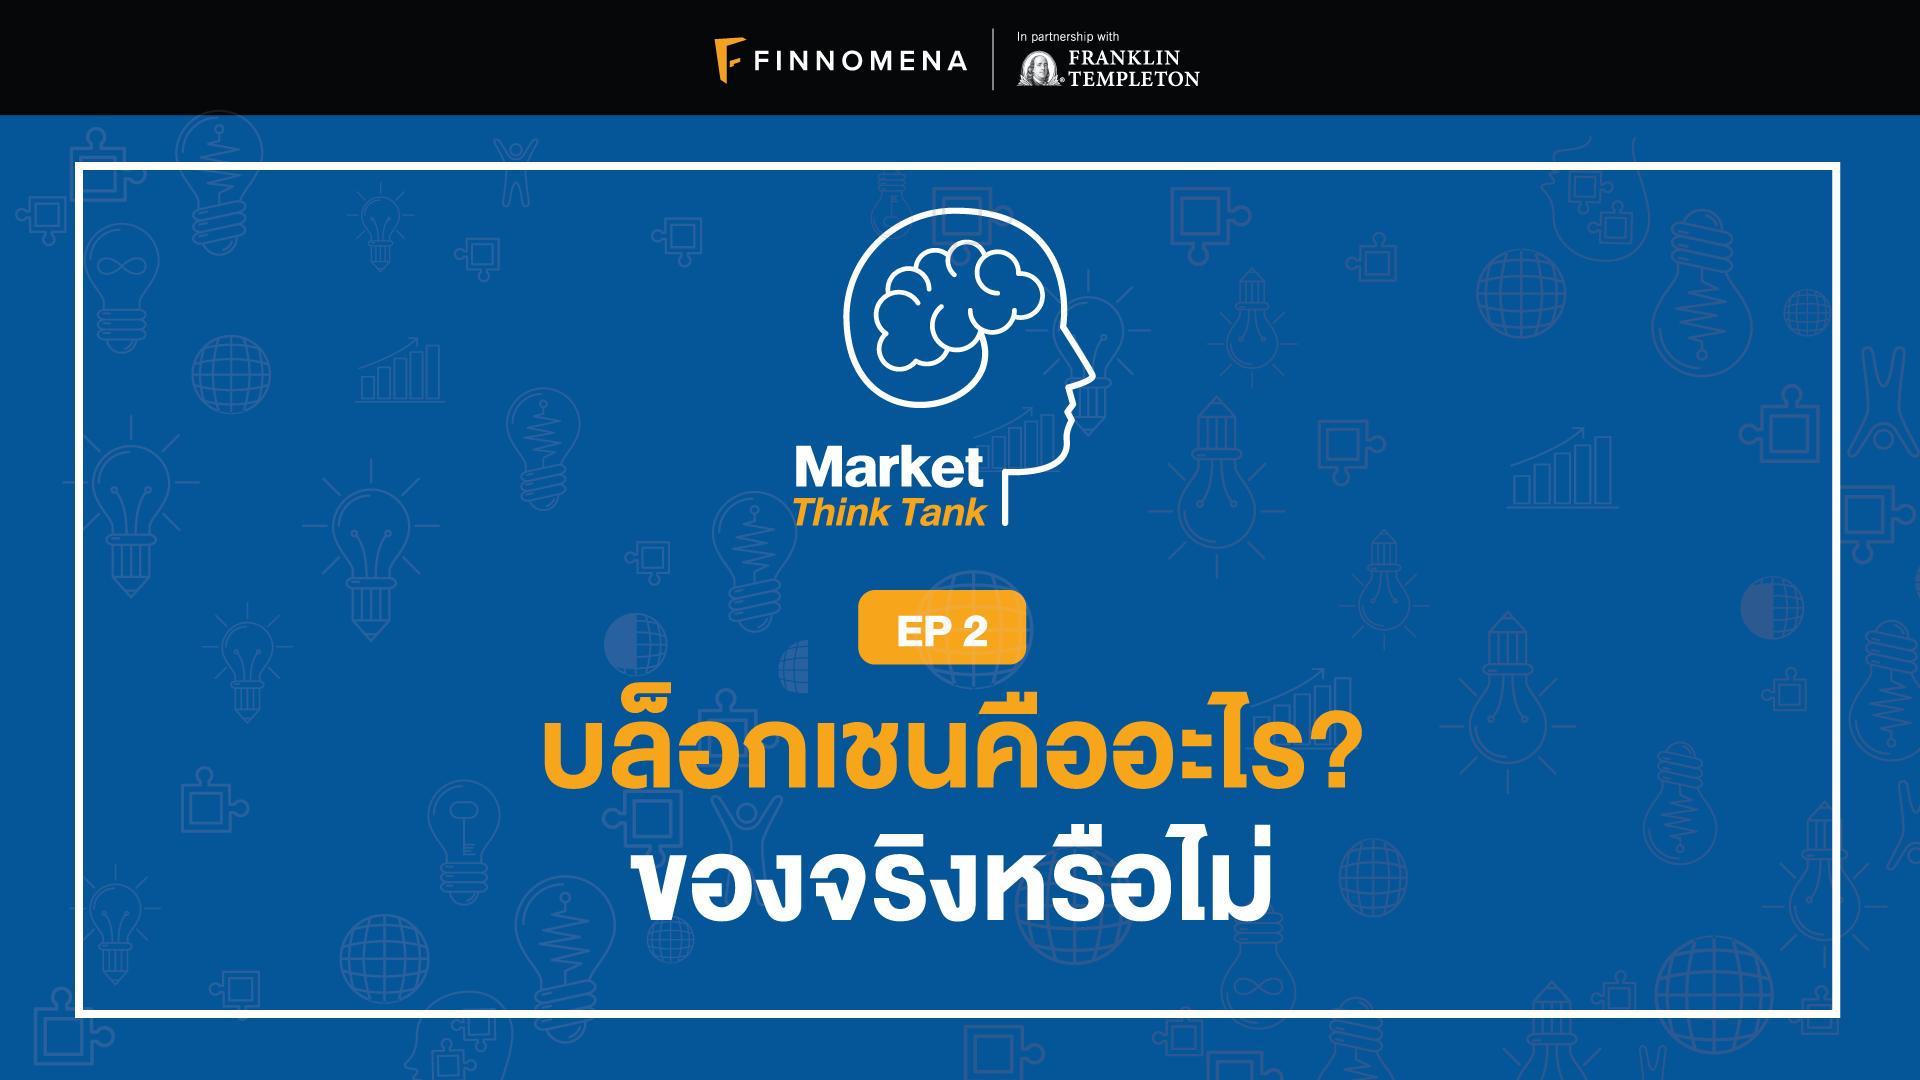 Market Think Tank EP 2: บล็อกเชนคืออะไร? ของจริงหรือไม่